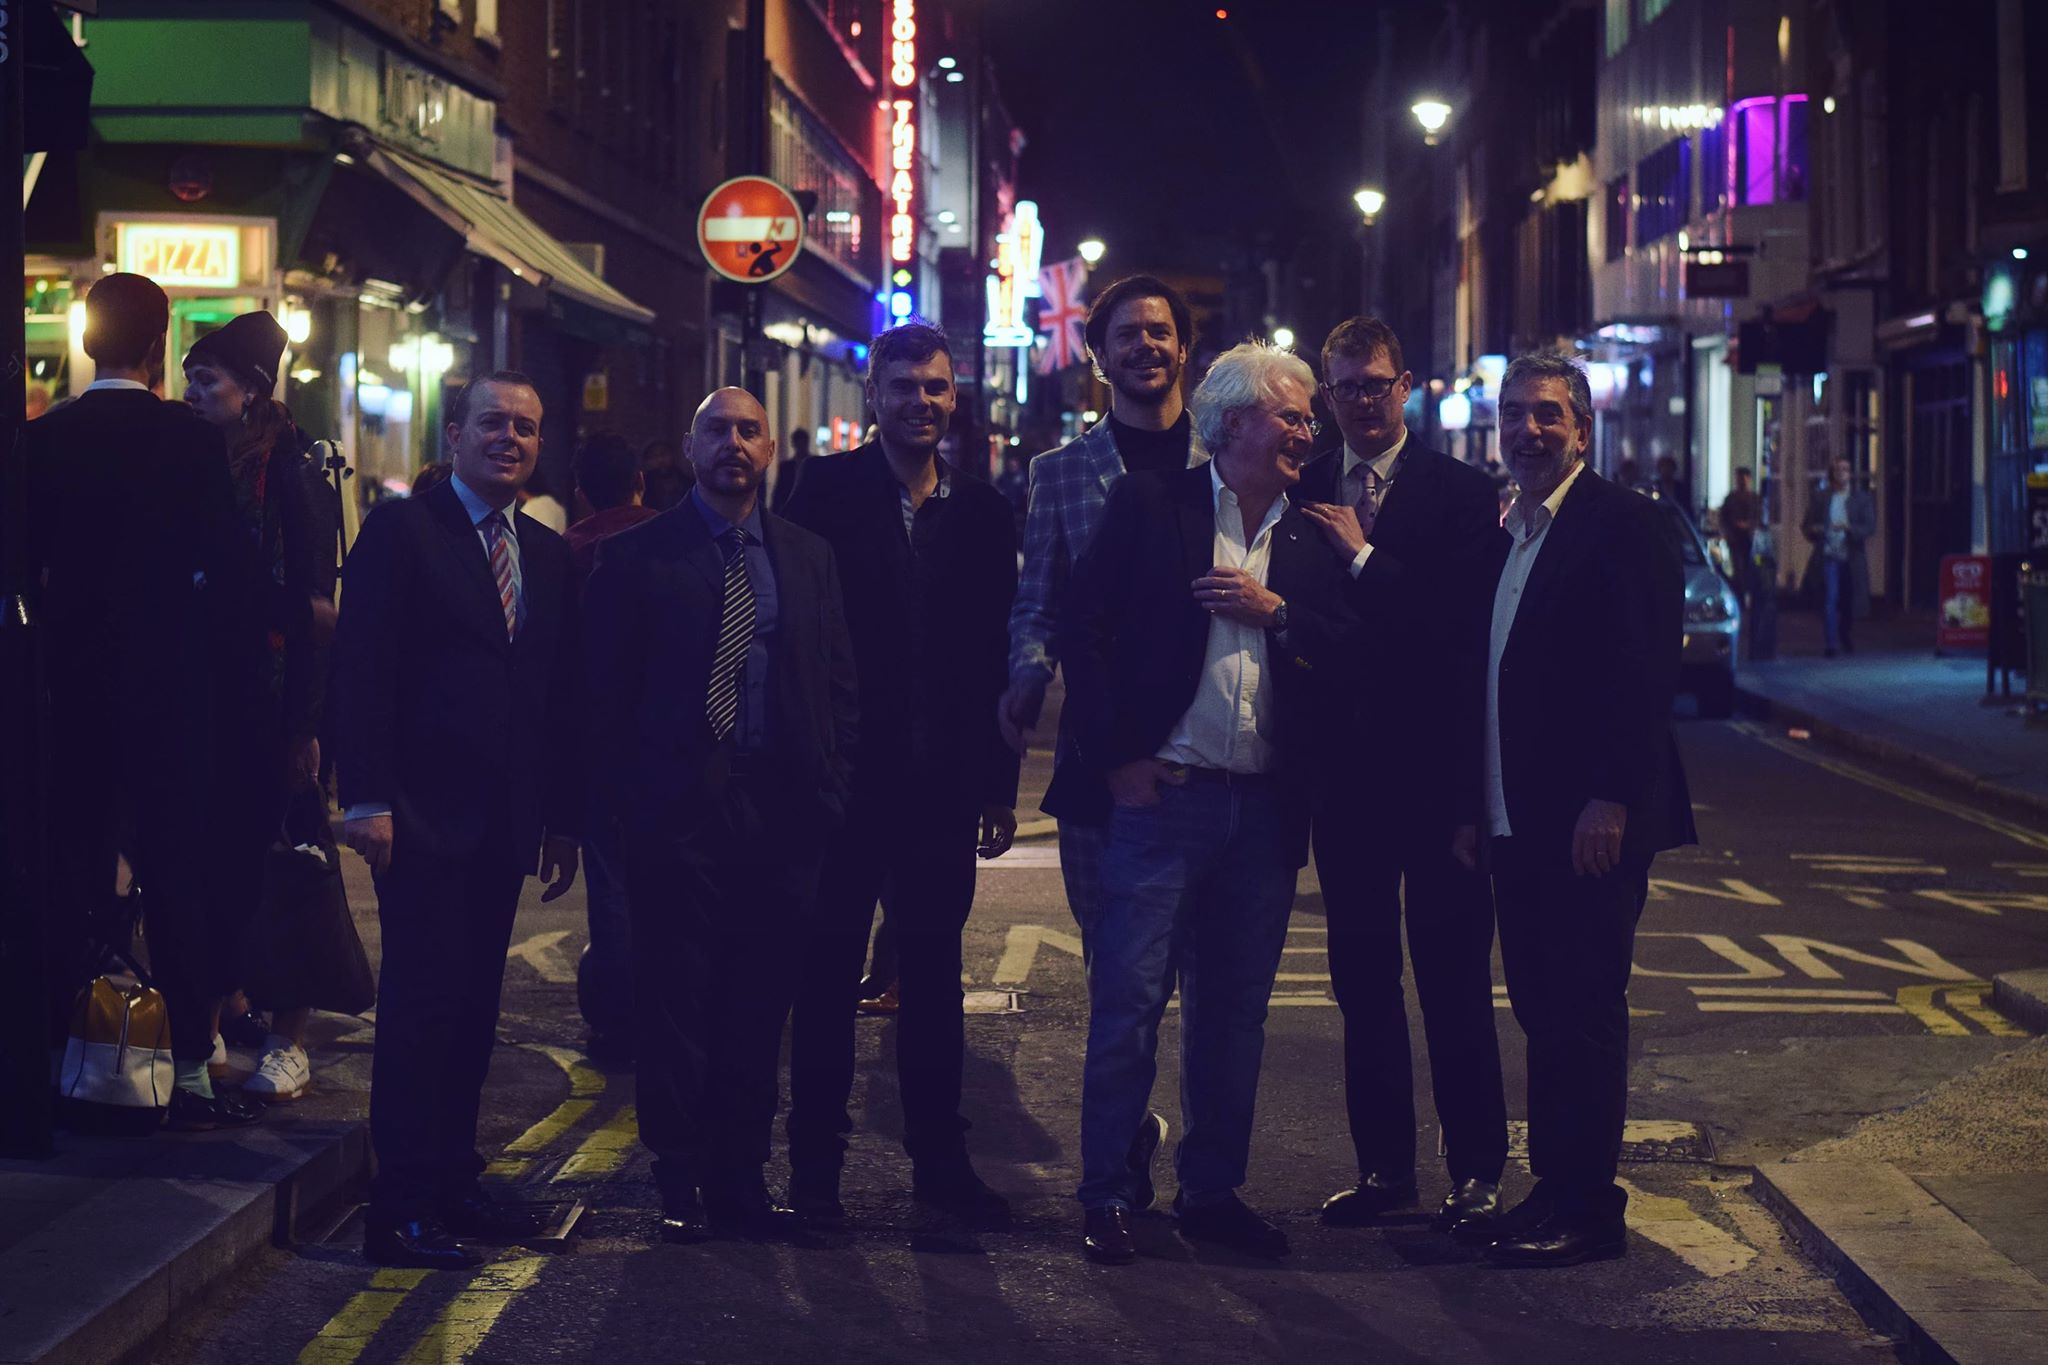 Bernd Reiter, Aldo Zunino, Erik Söderlind, Seamus Blake, Martin Hummel, Eric Alexander, Mike LeDonne